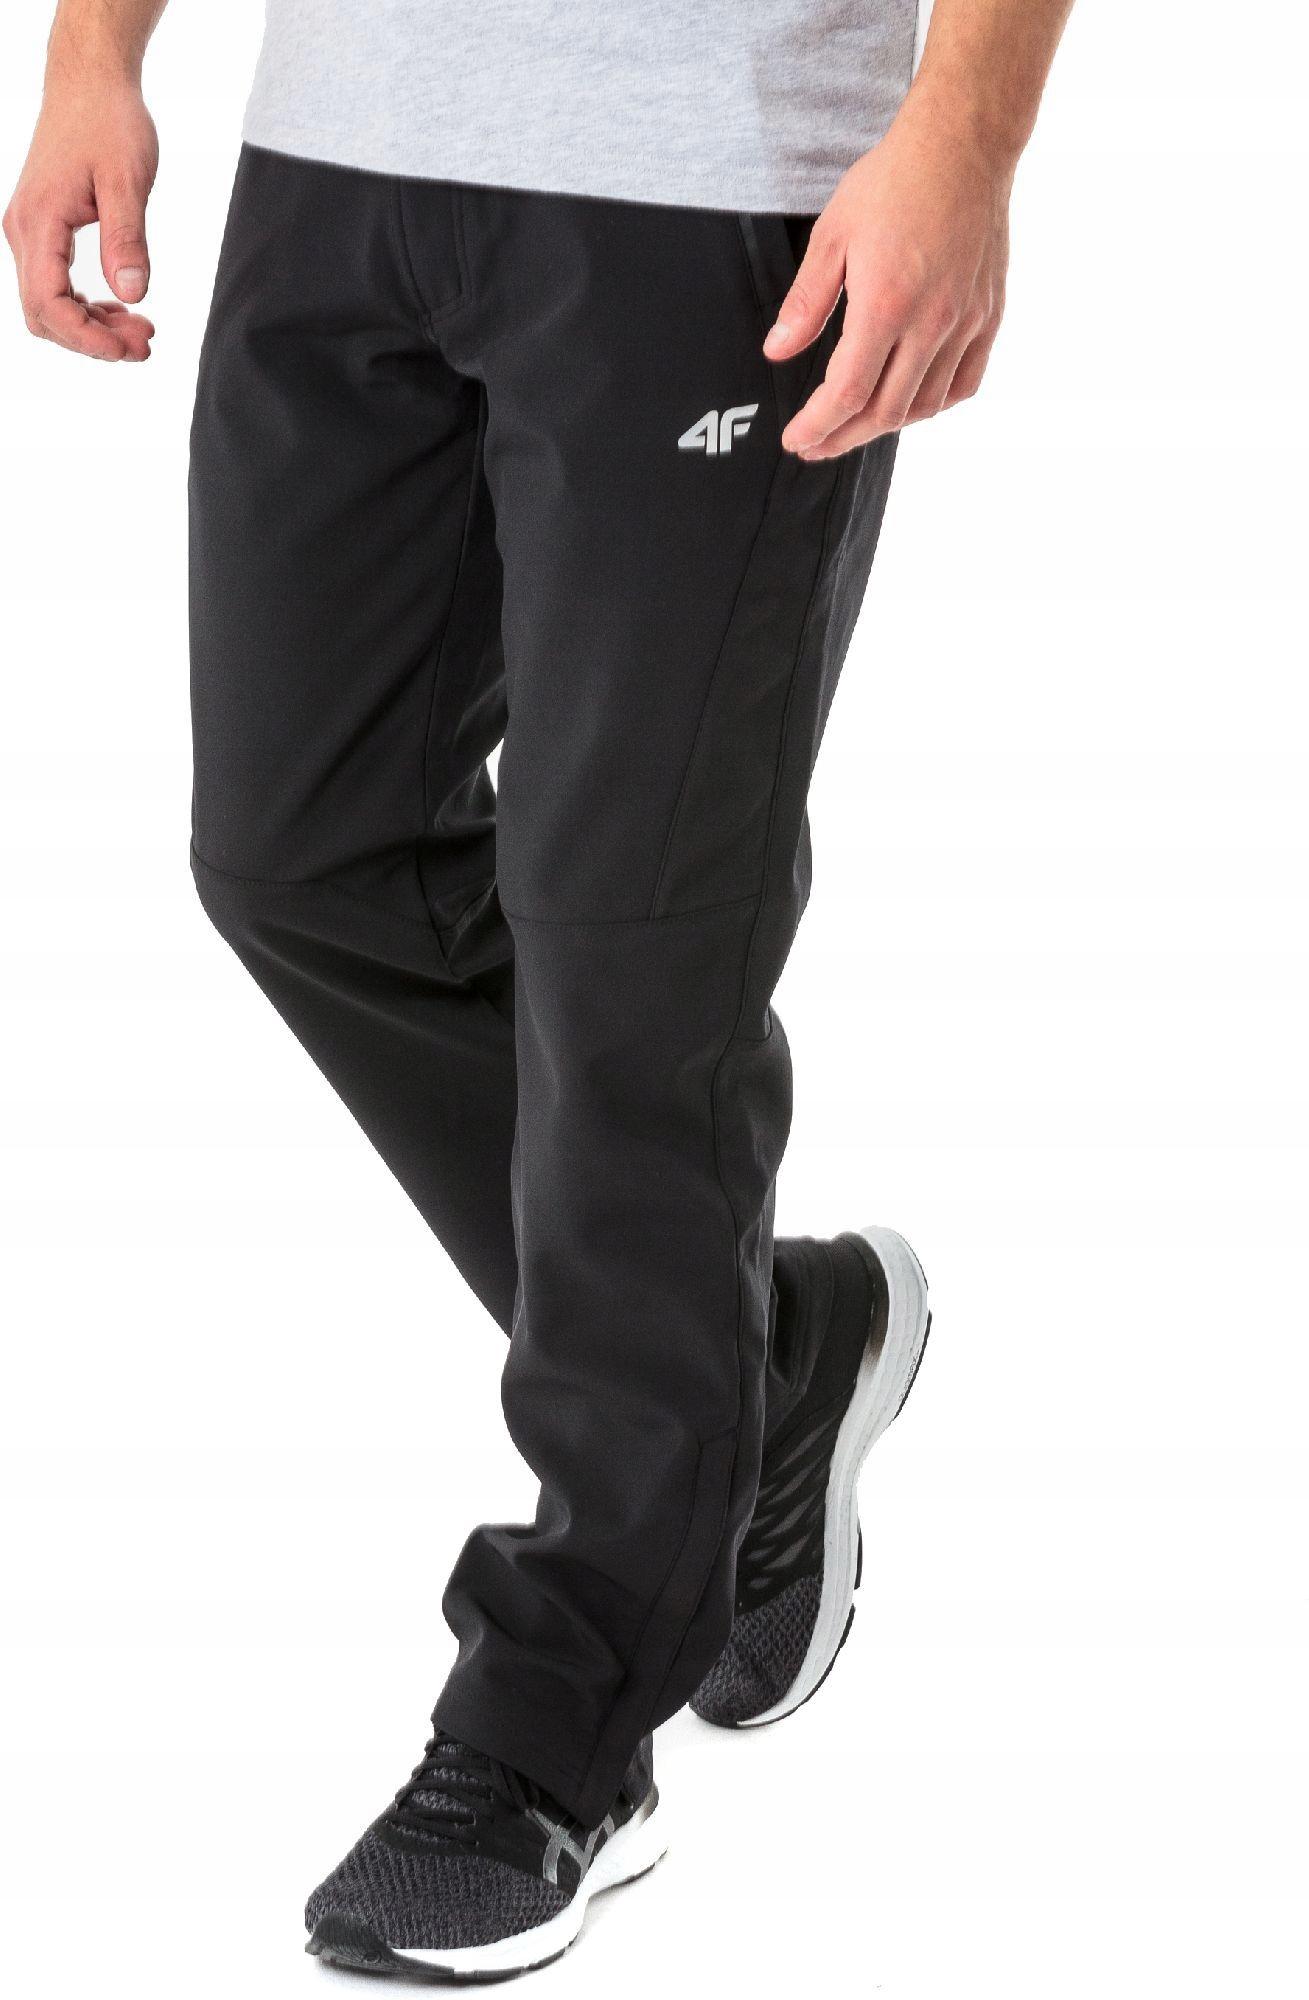 4f Spodnie softshell męskie H4L18-SPMT002 r. XXL